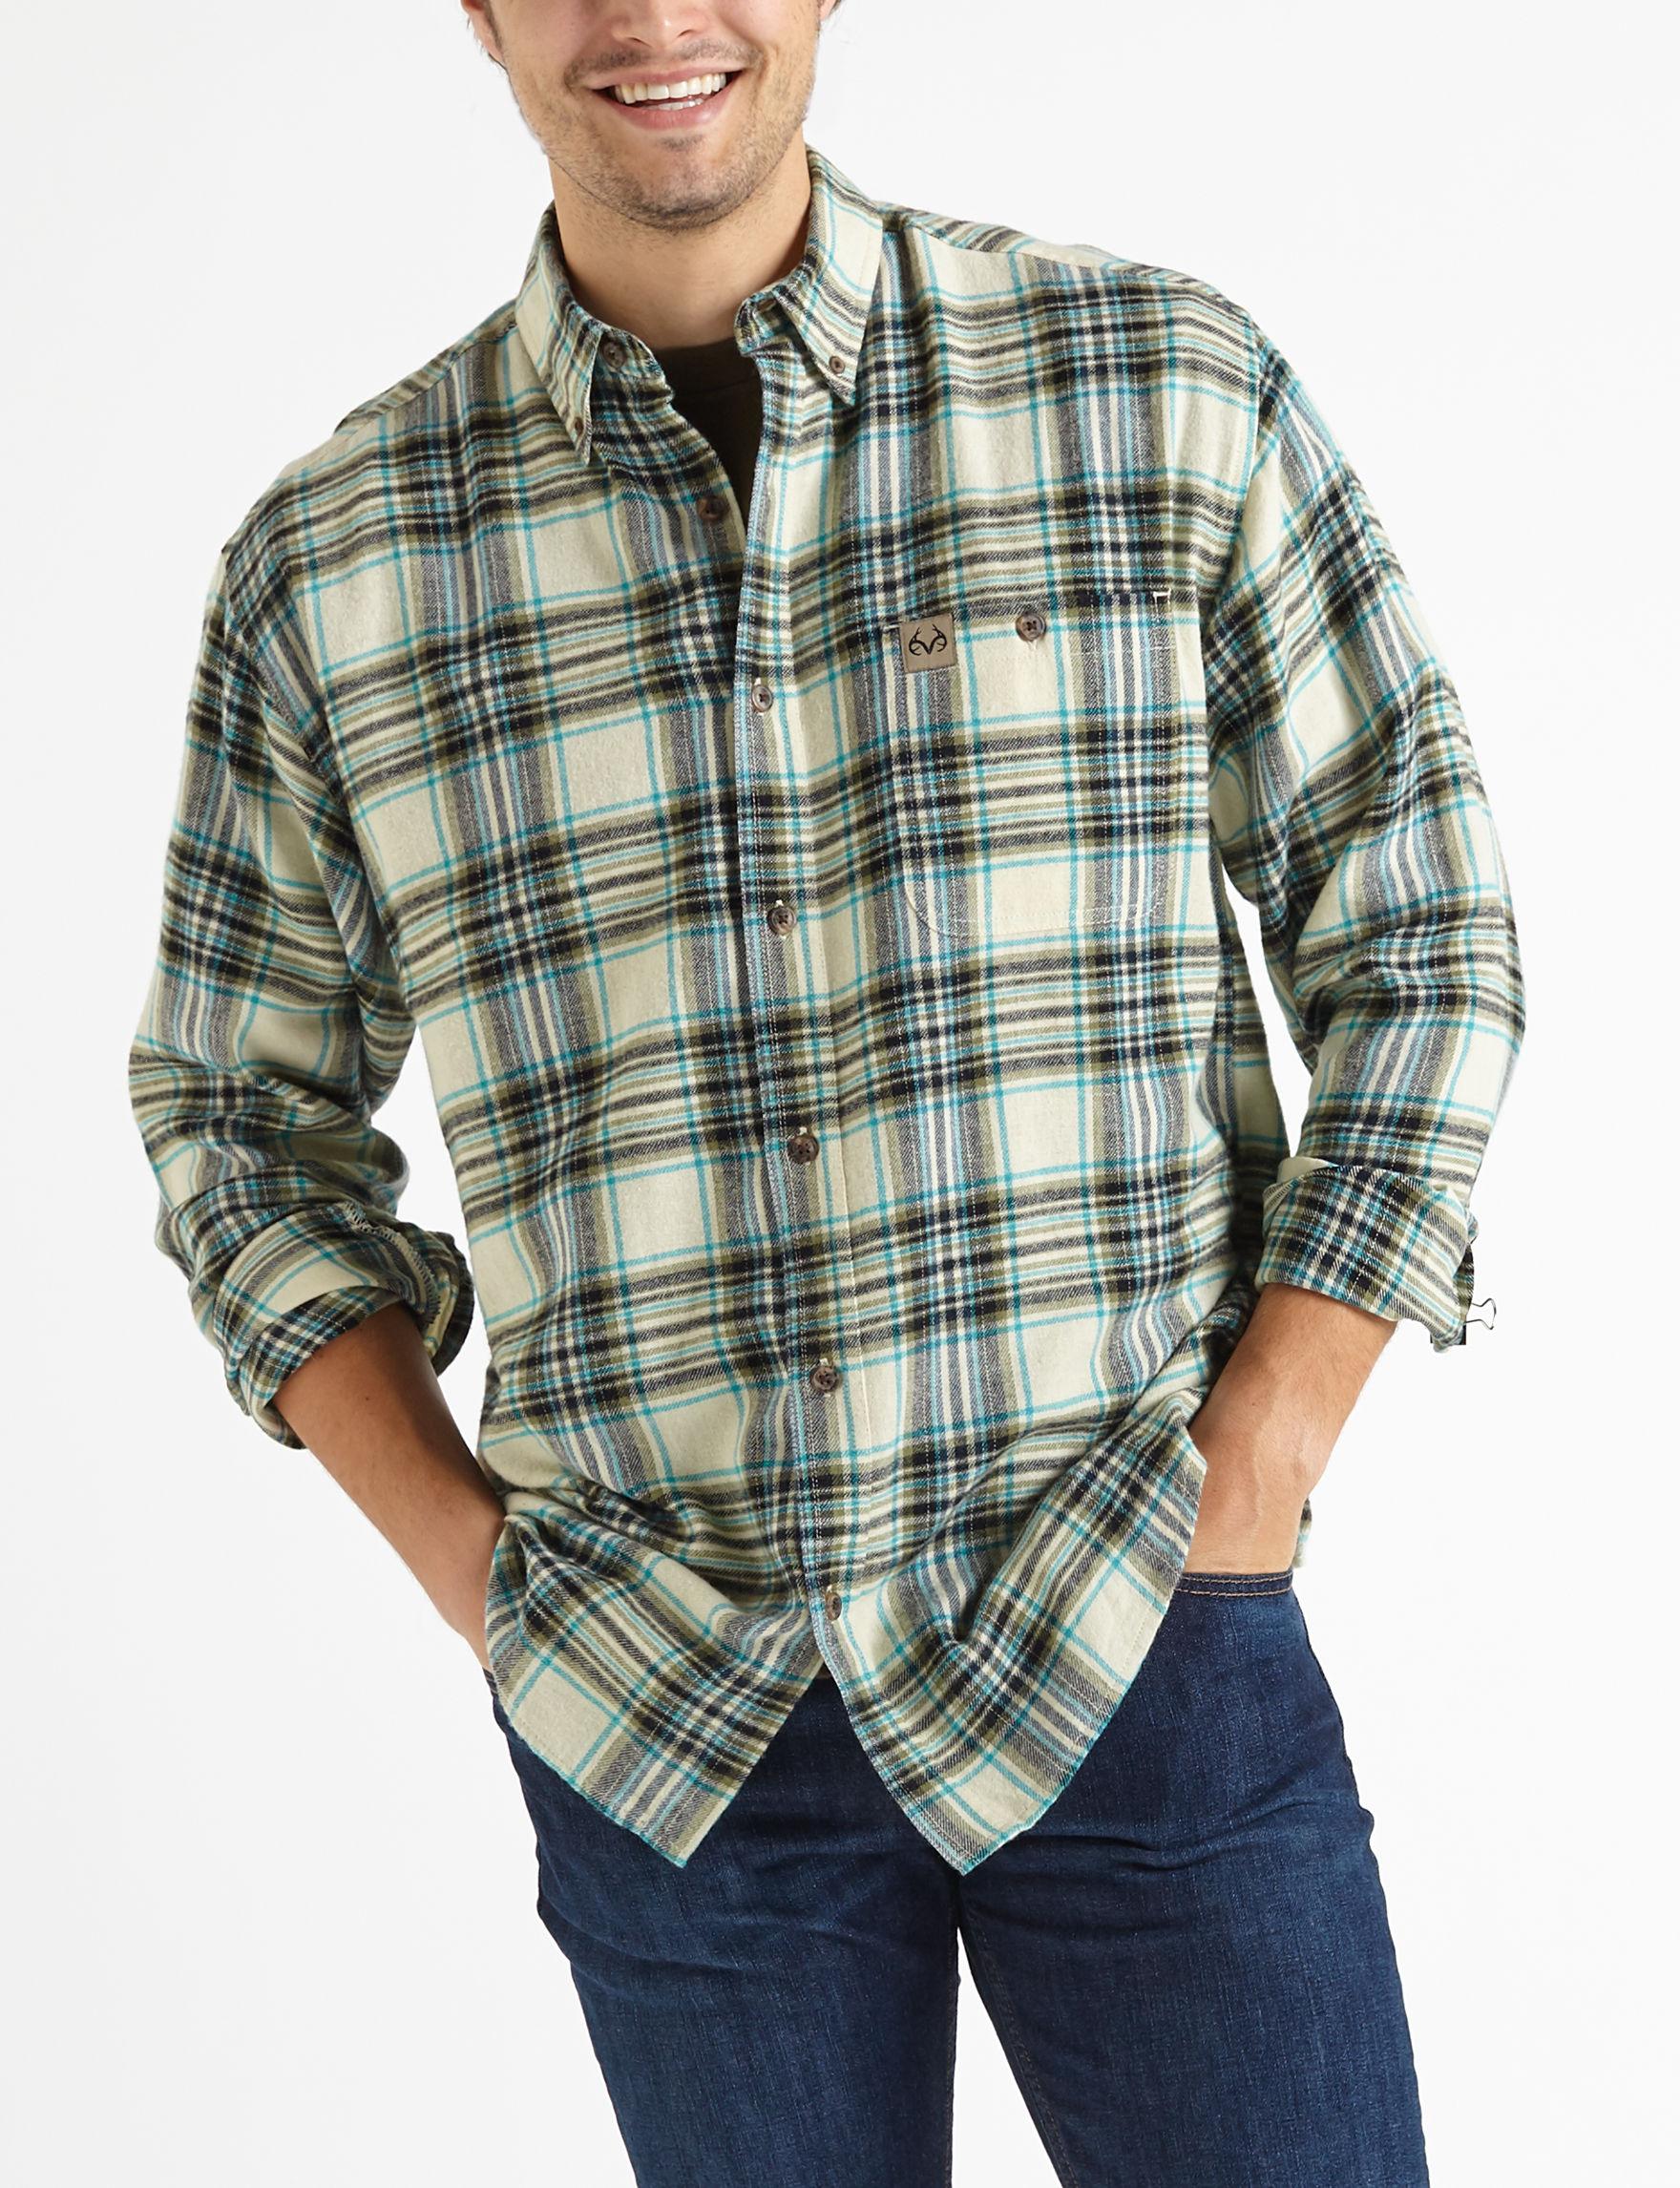 Realtree Dark Brown Casual Button Down Shirts